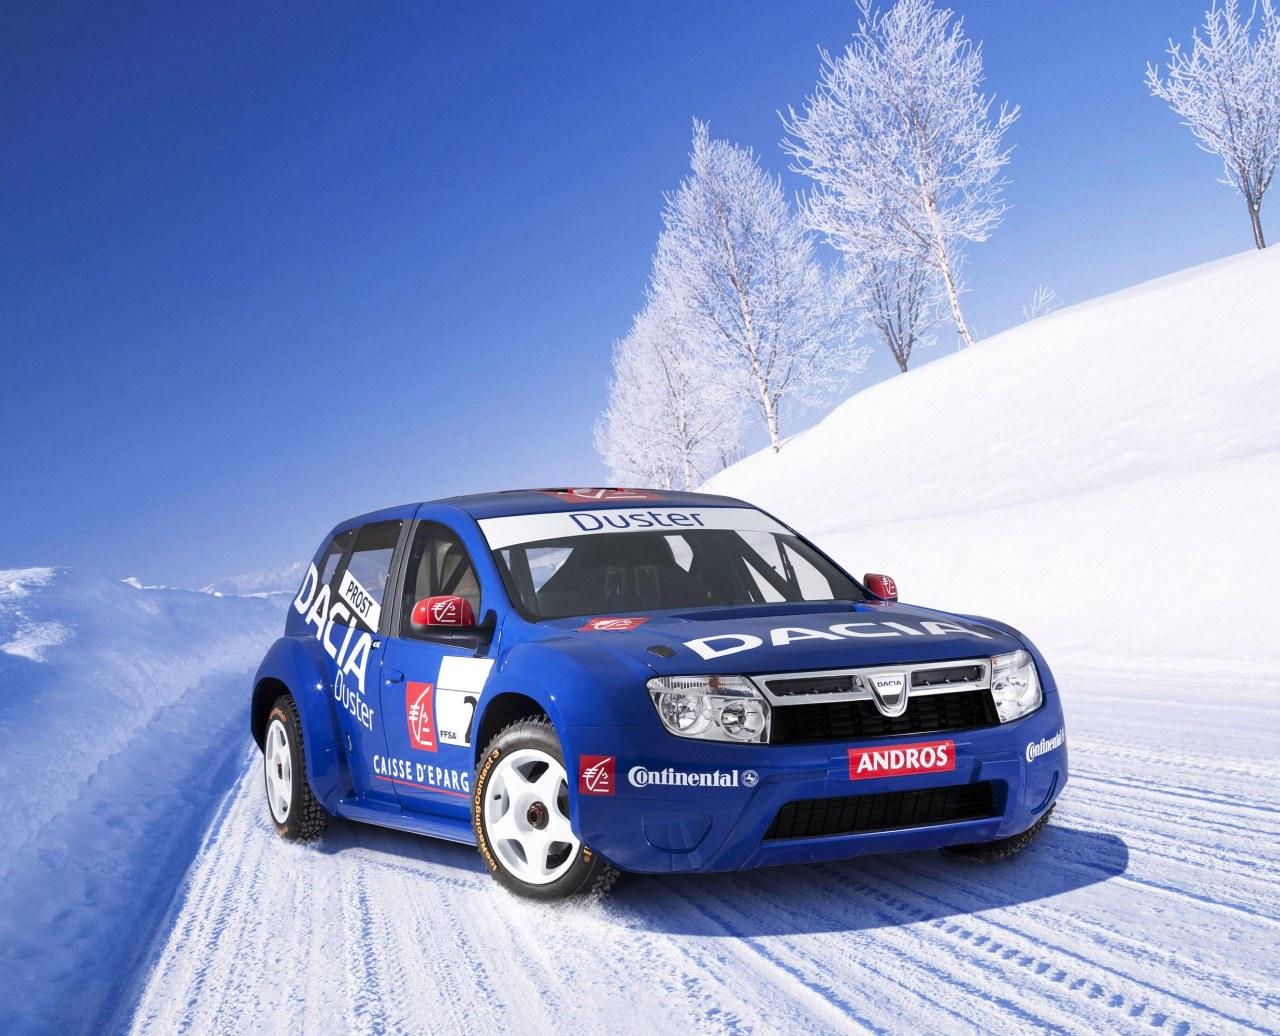 Dacia_Duster_ijsracer_1.jpg